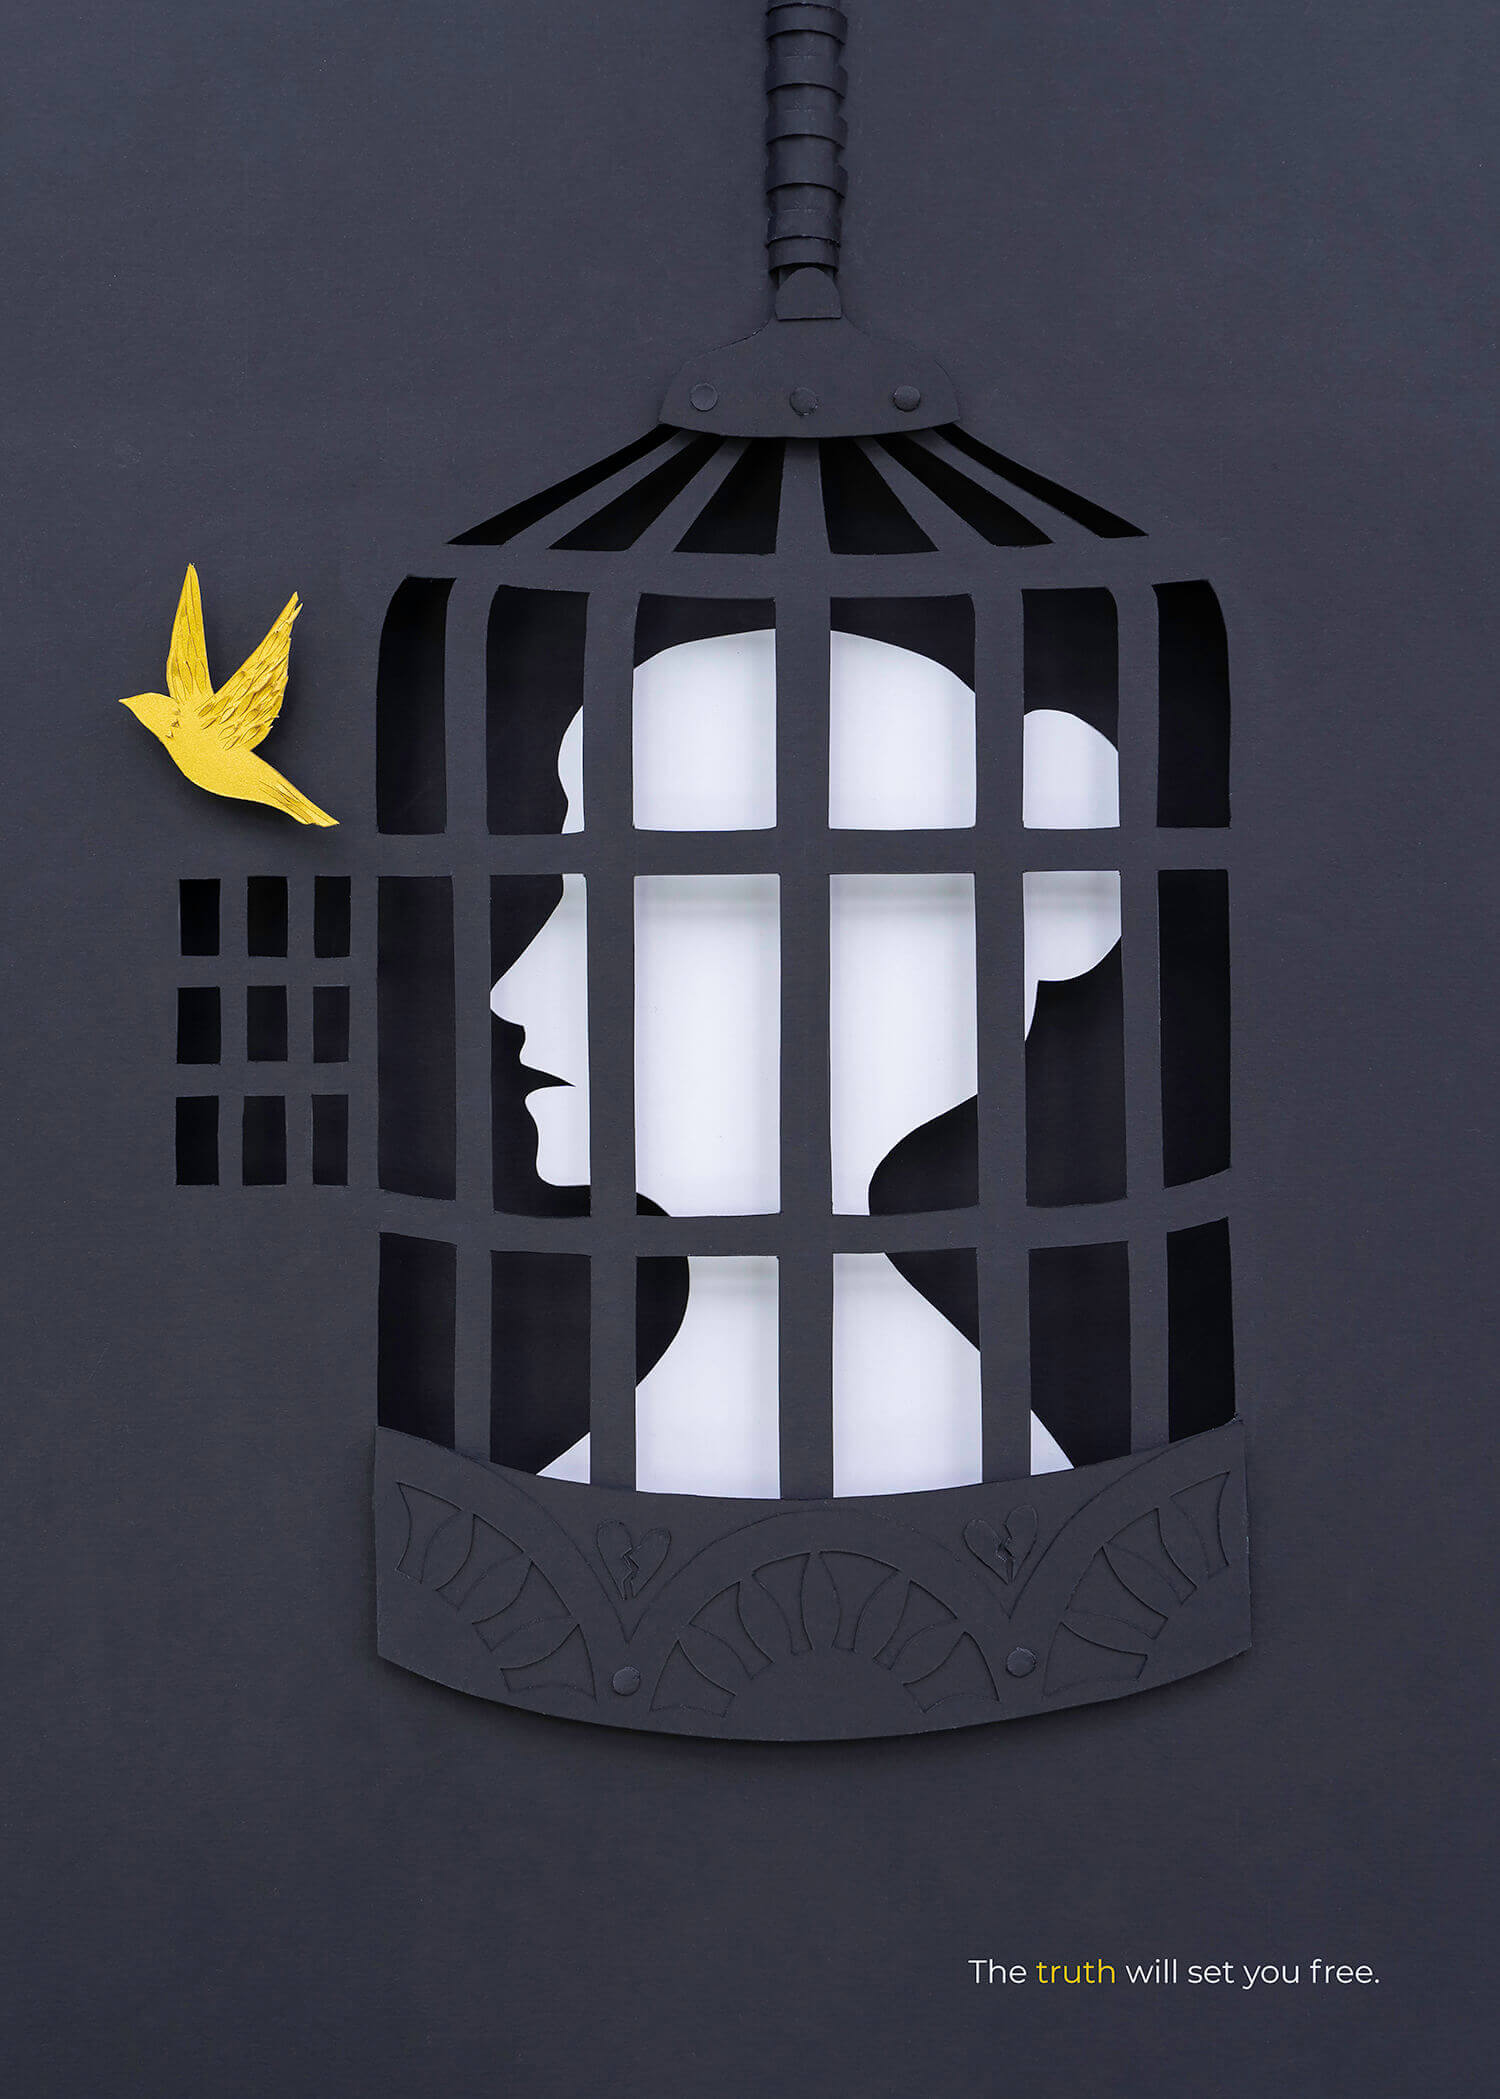 Free As A Bird main image